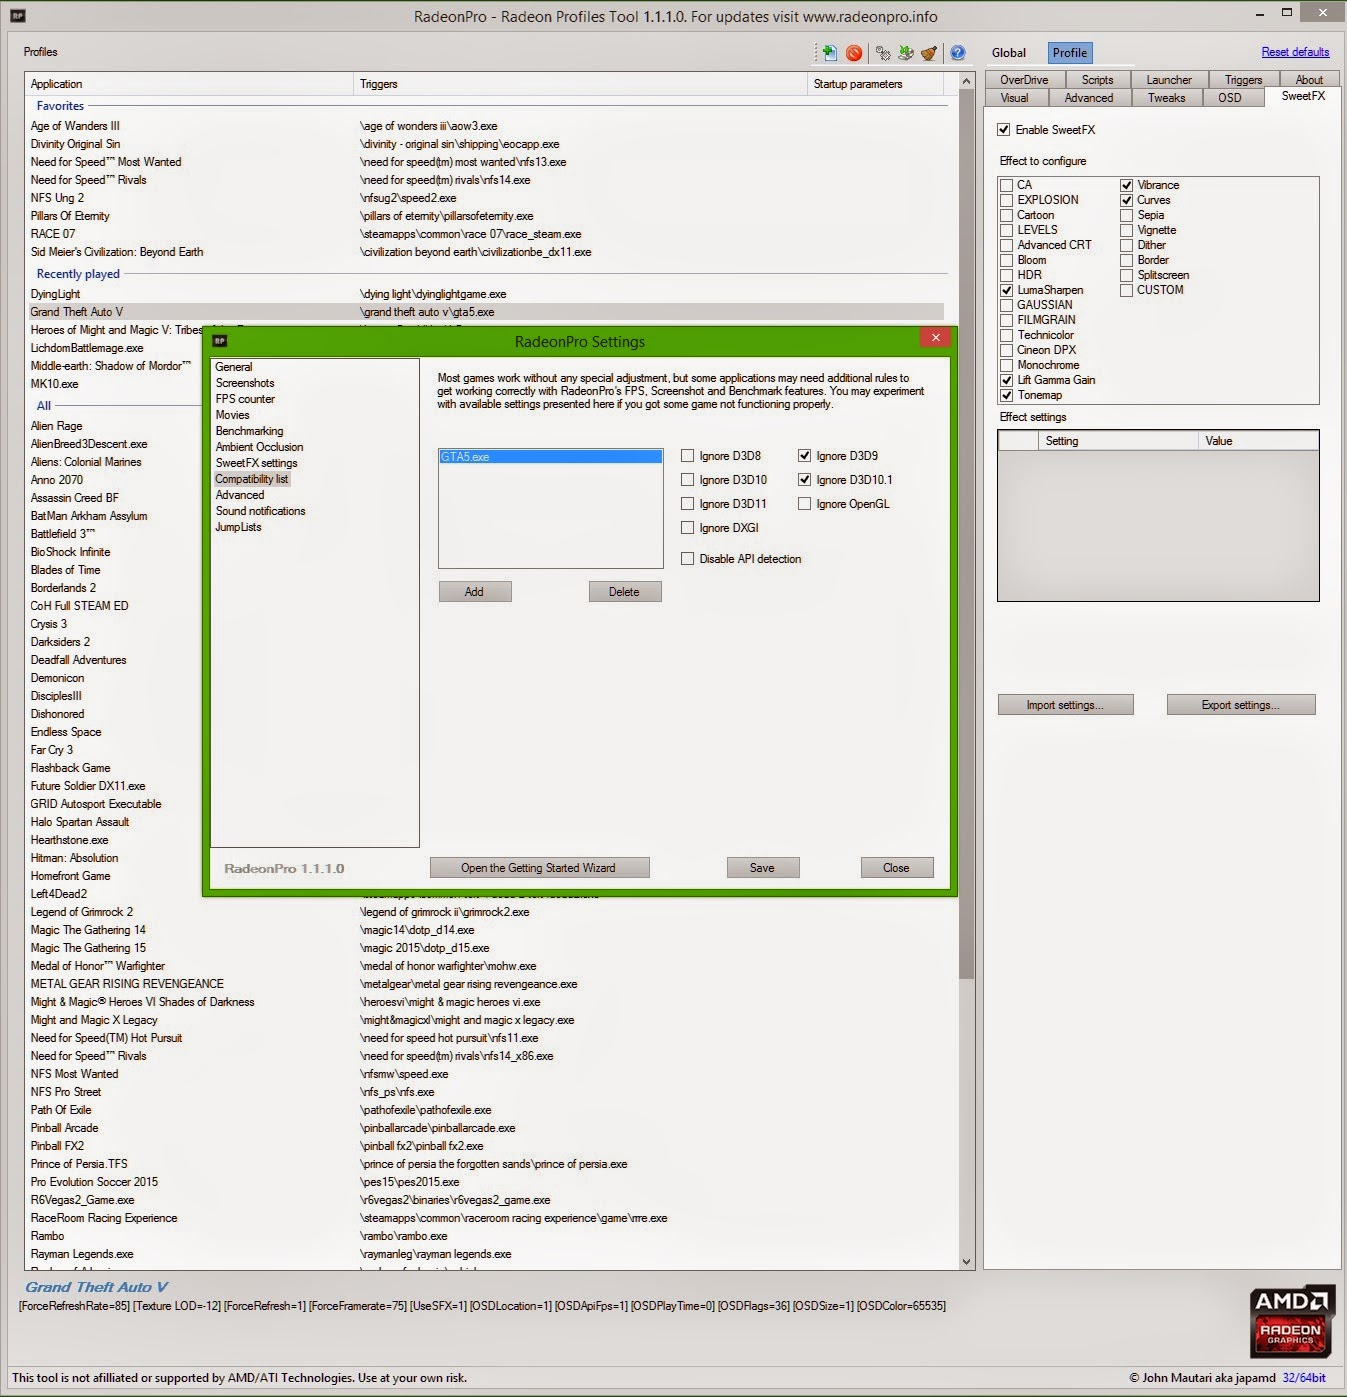 Fine young Artists CREOstvdivm: ------> Tweaks & Tips for AMD/Radeon